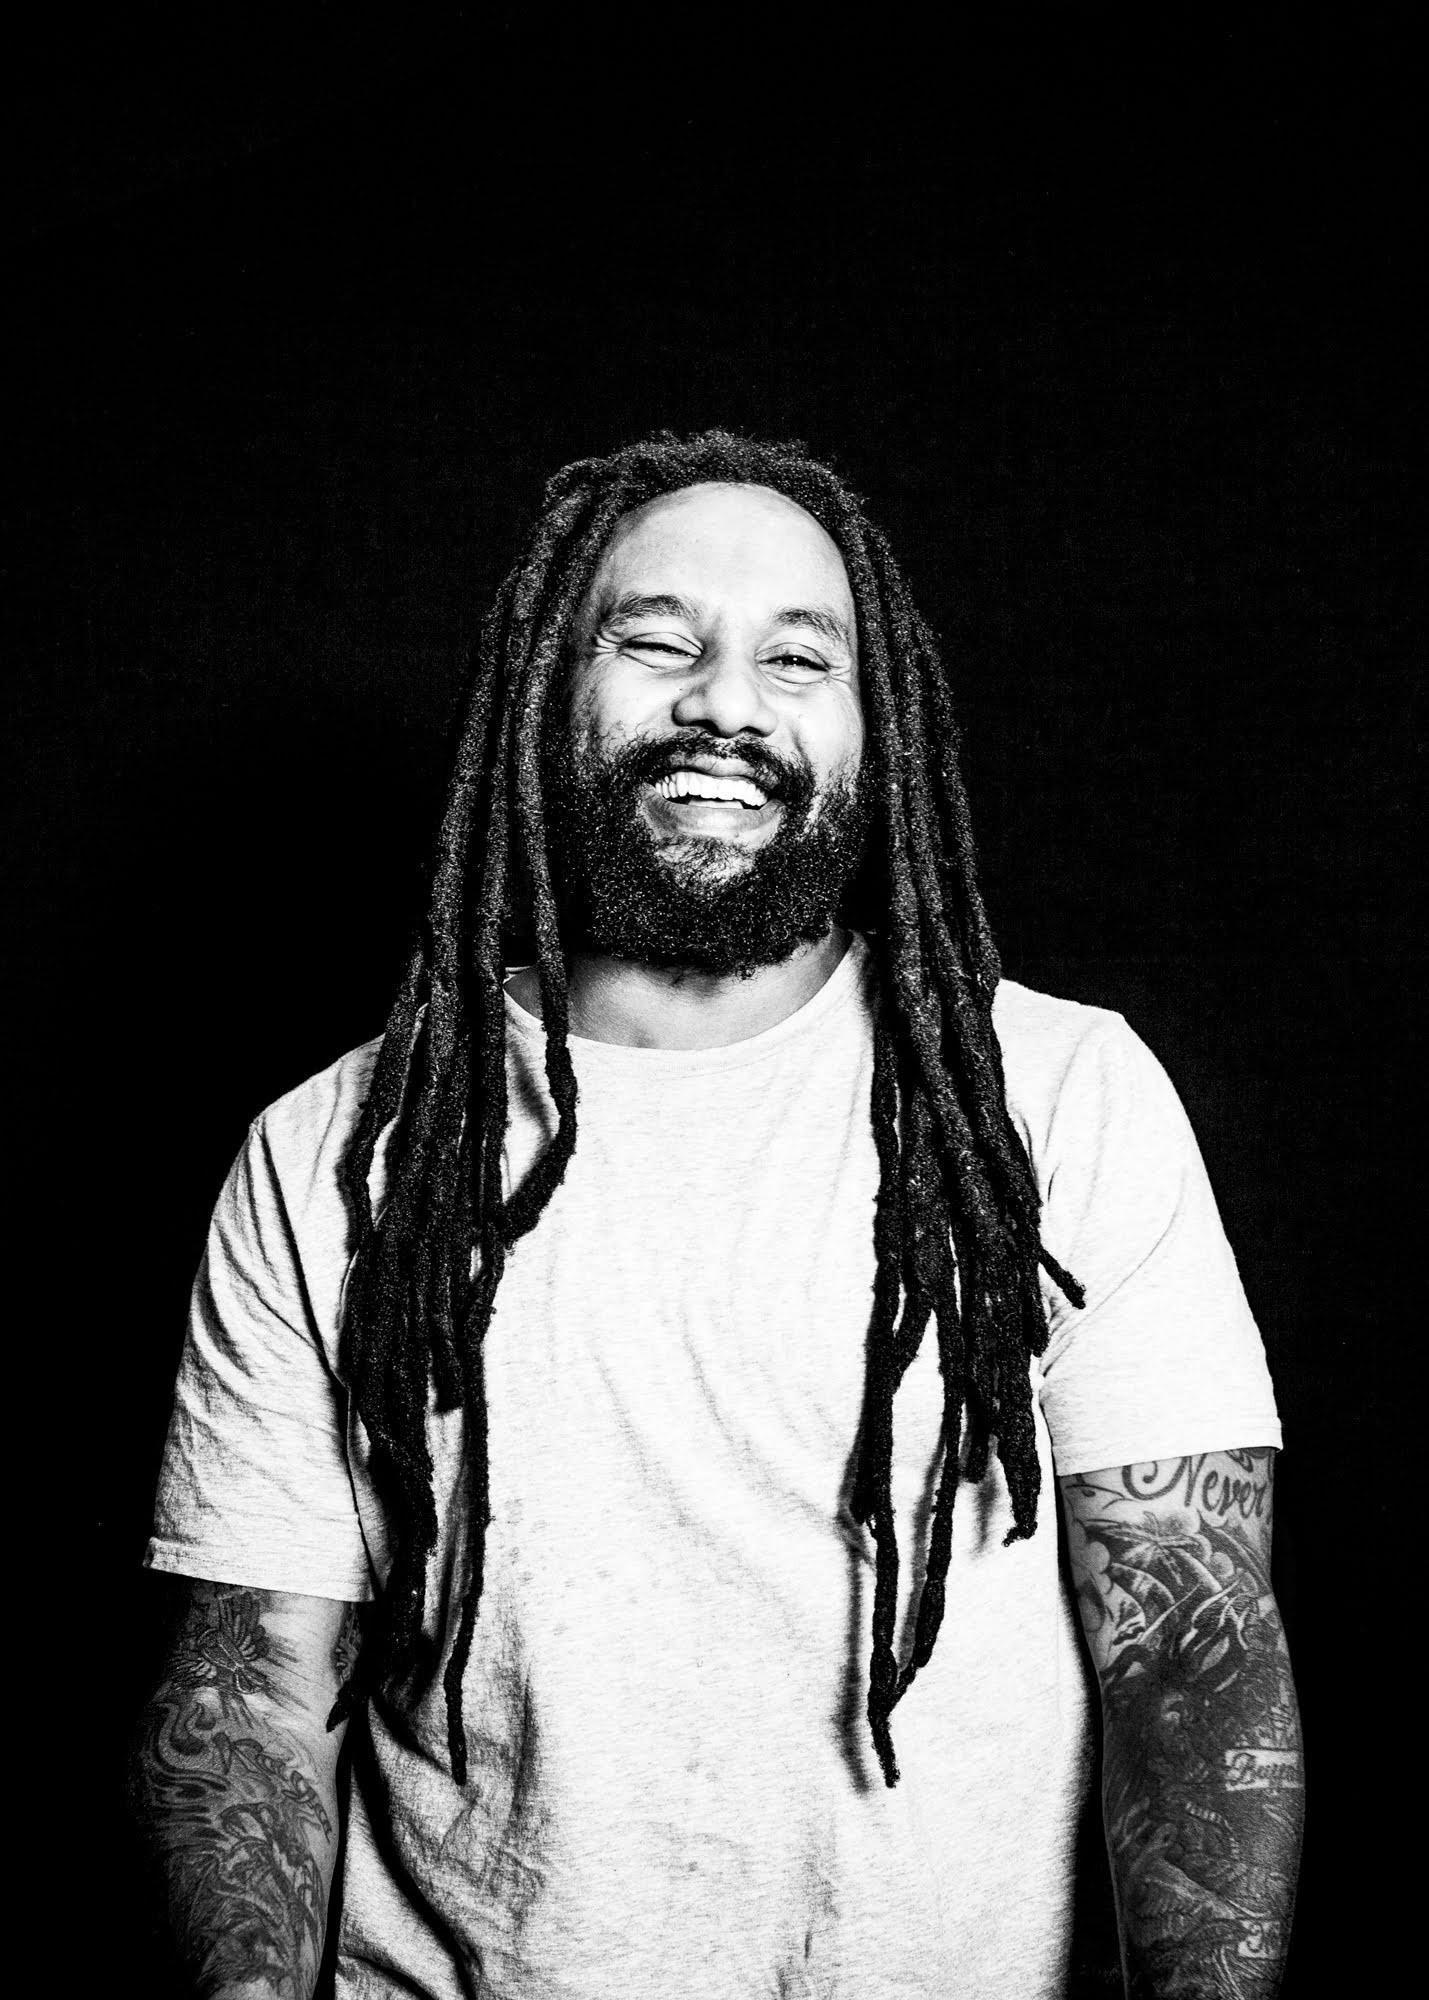 ky many marley-reggae sun ska- official portrait